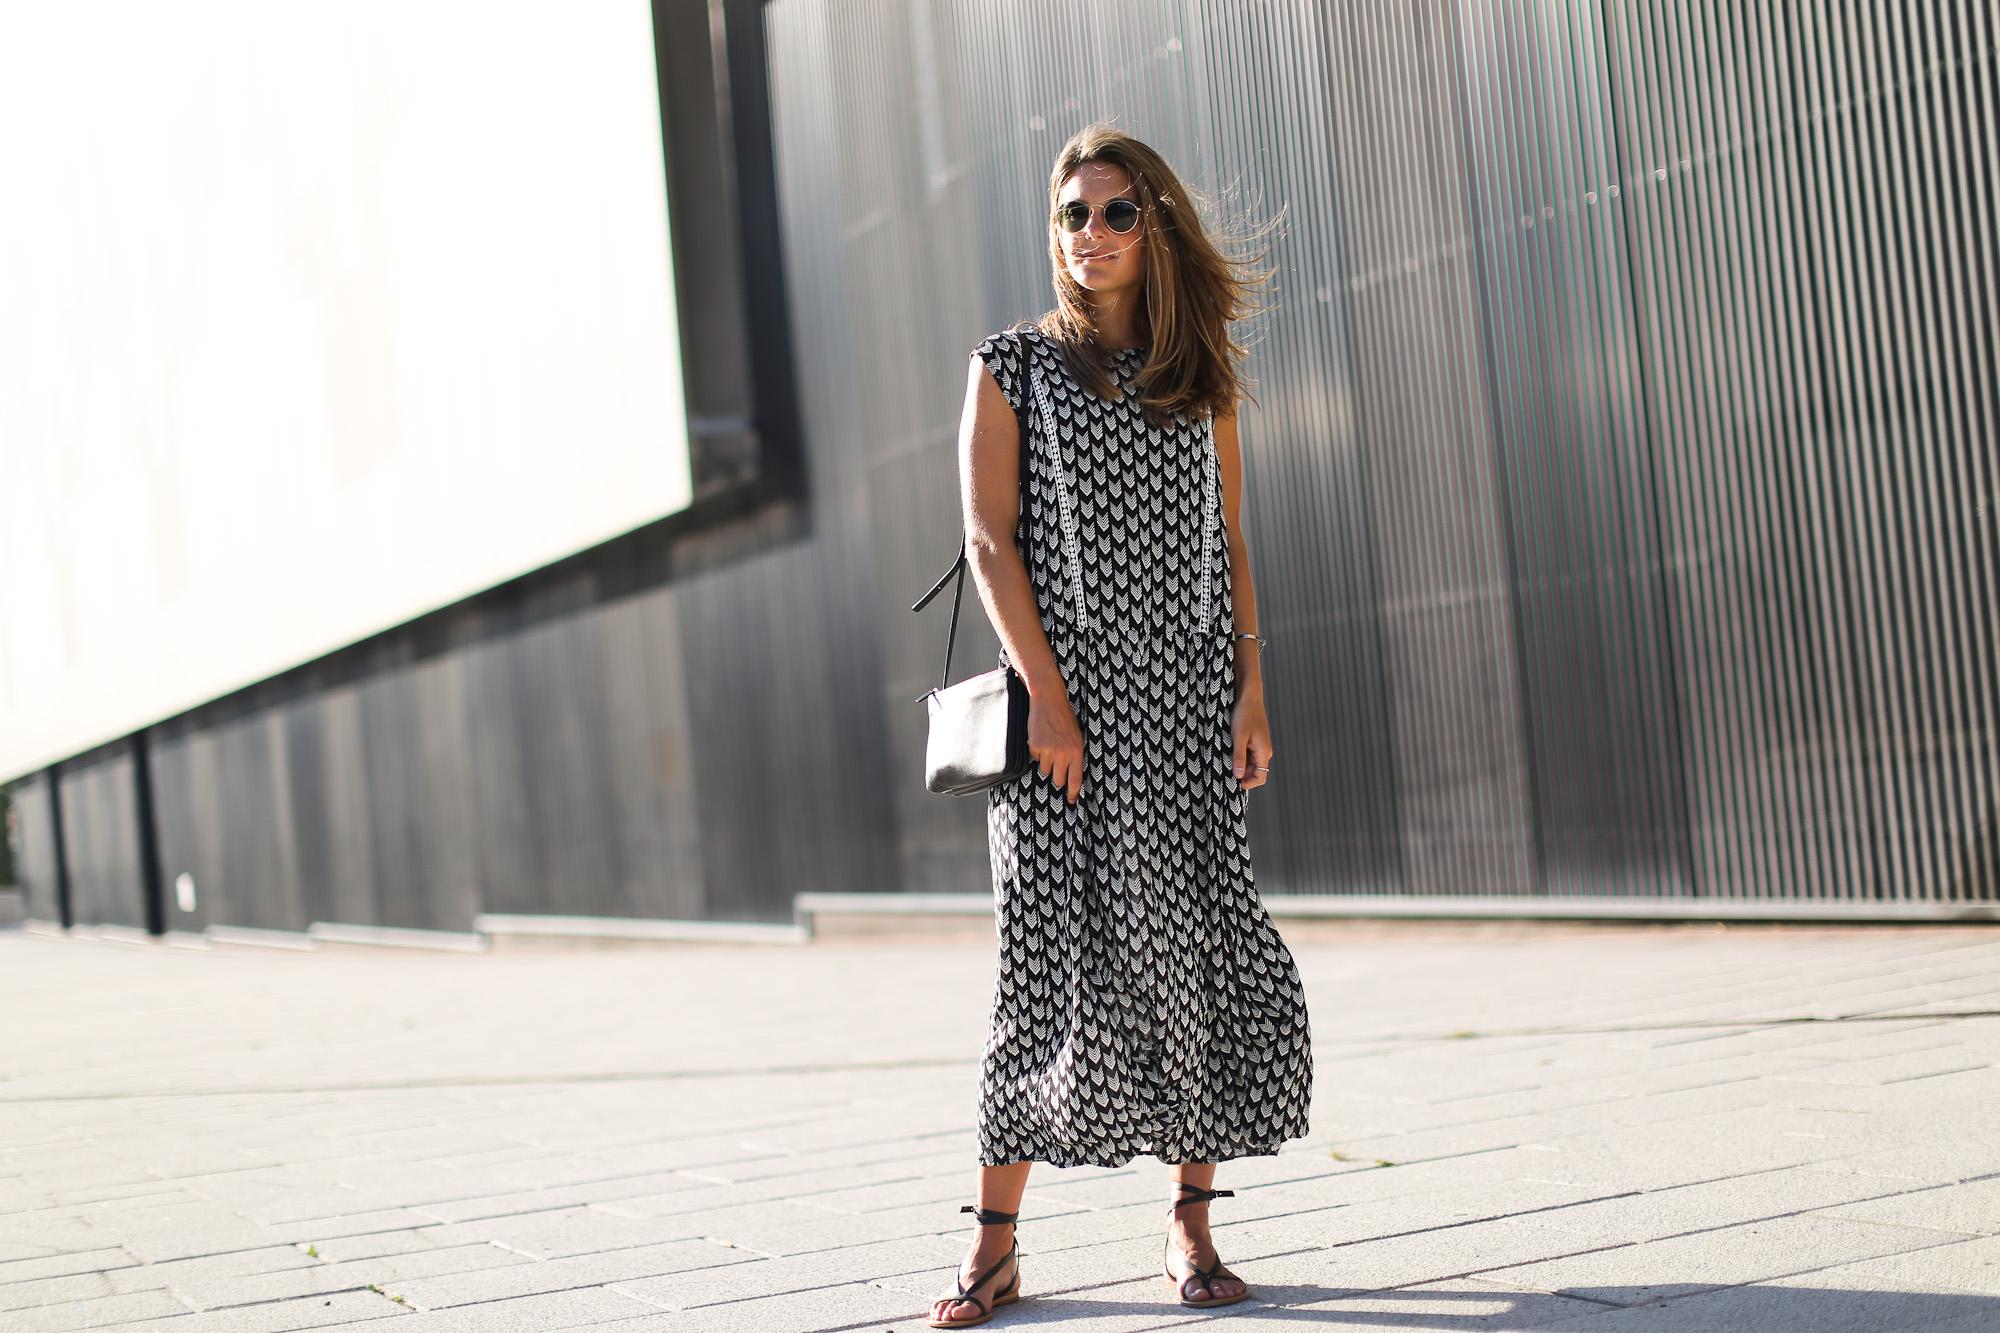 Clochet_streetstyle_chicwish_midi_printed_summer_dress-9